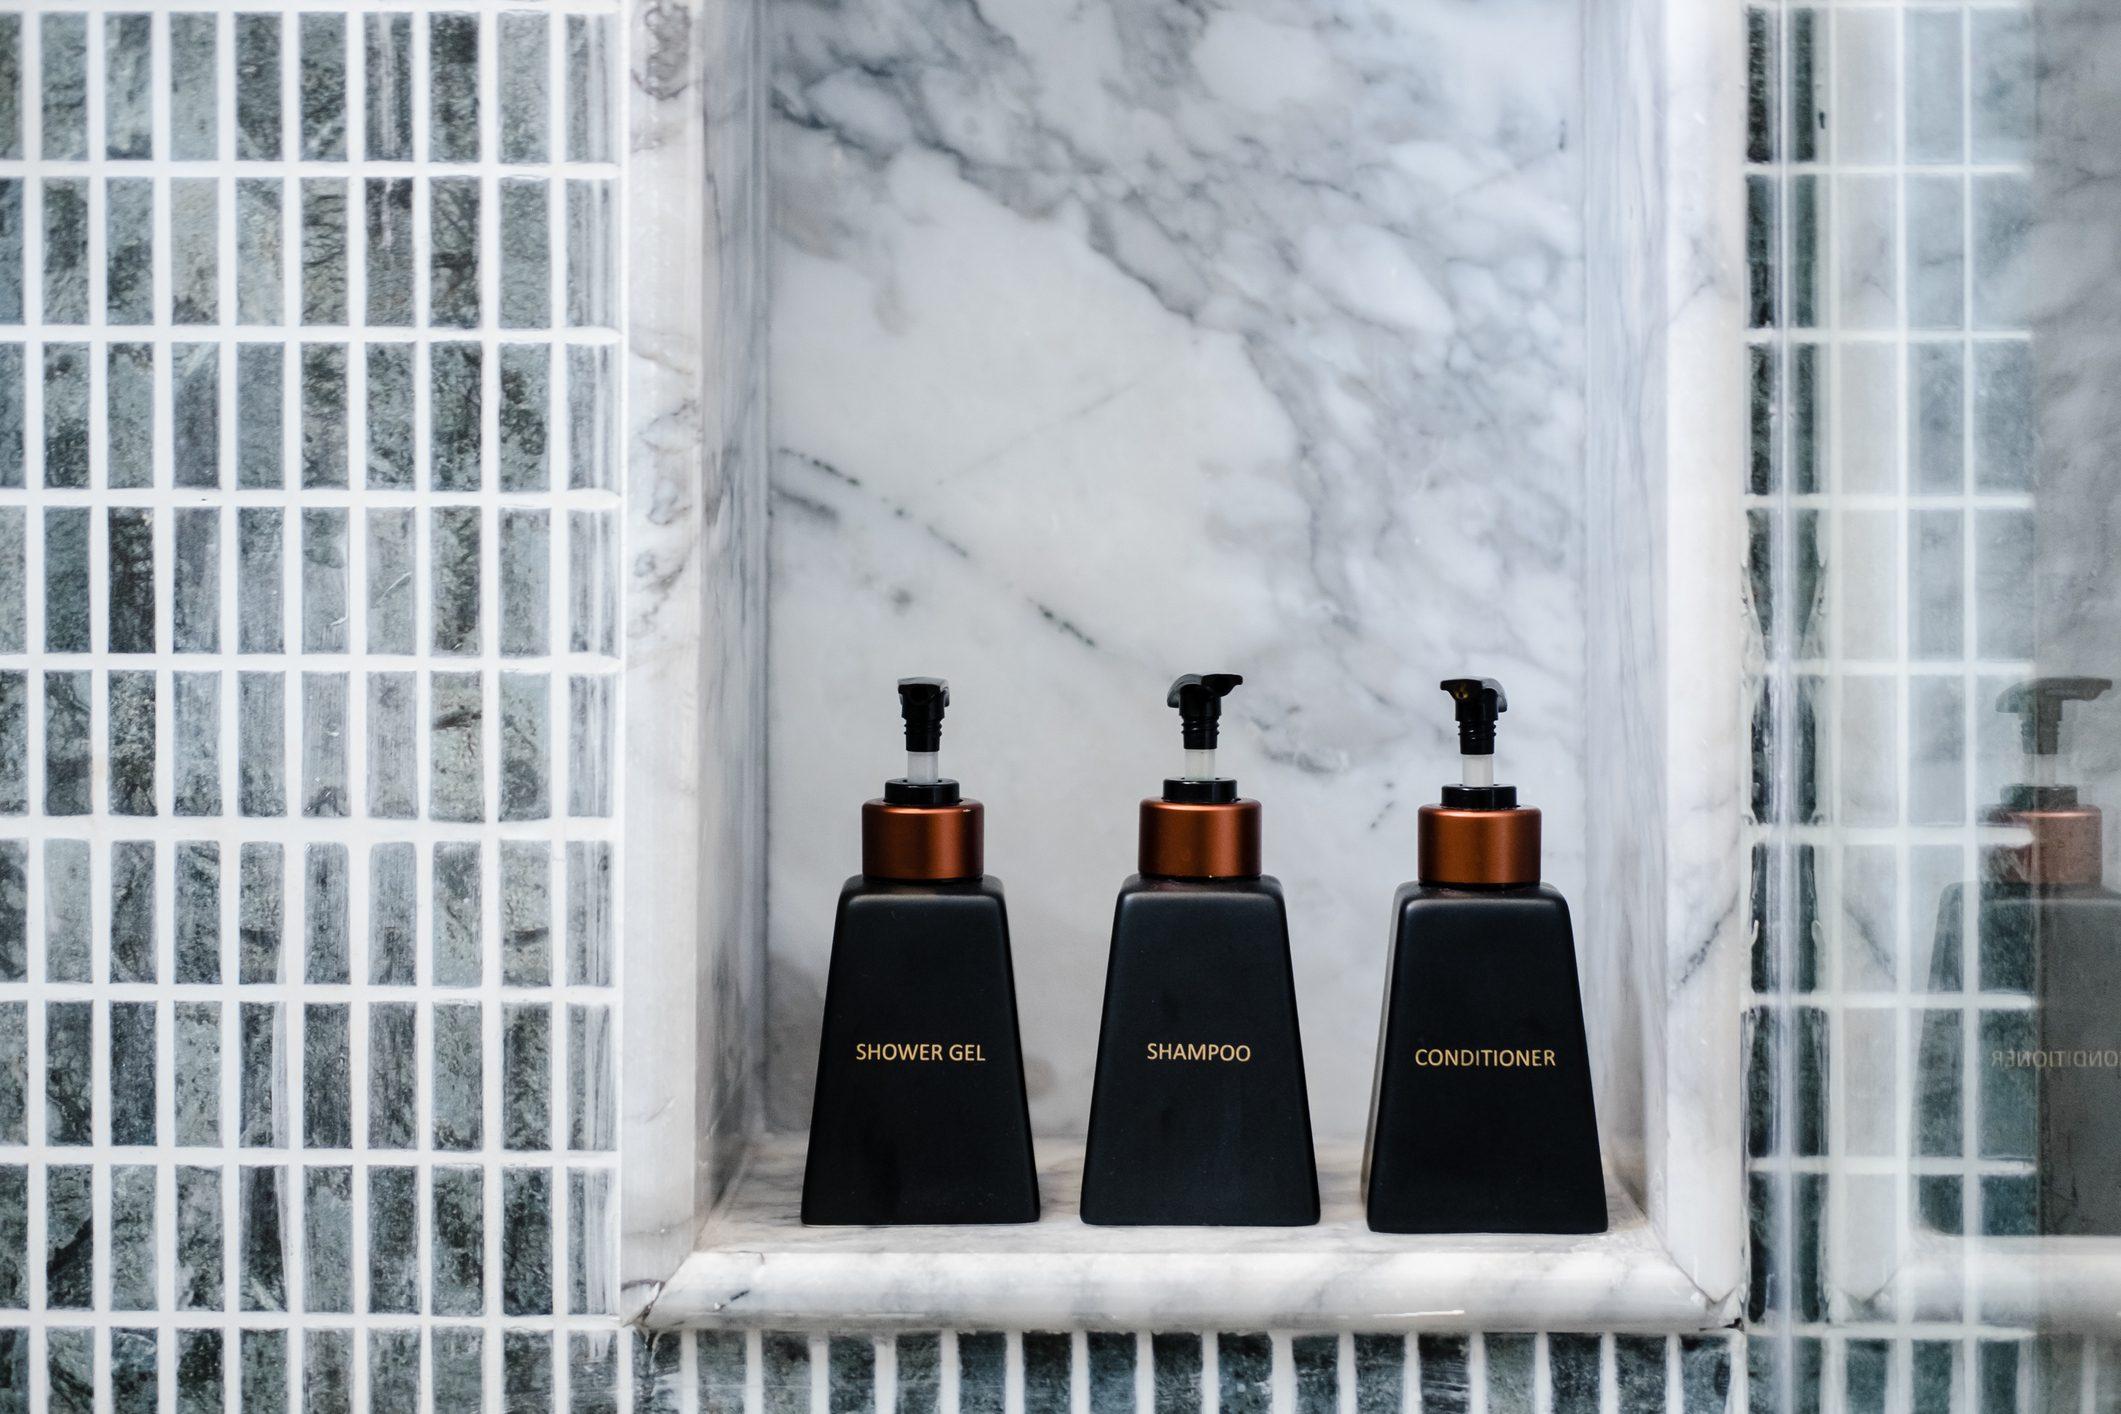 Bathroom toiletries on marble shelf in a hotel shower